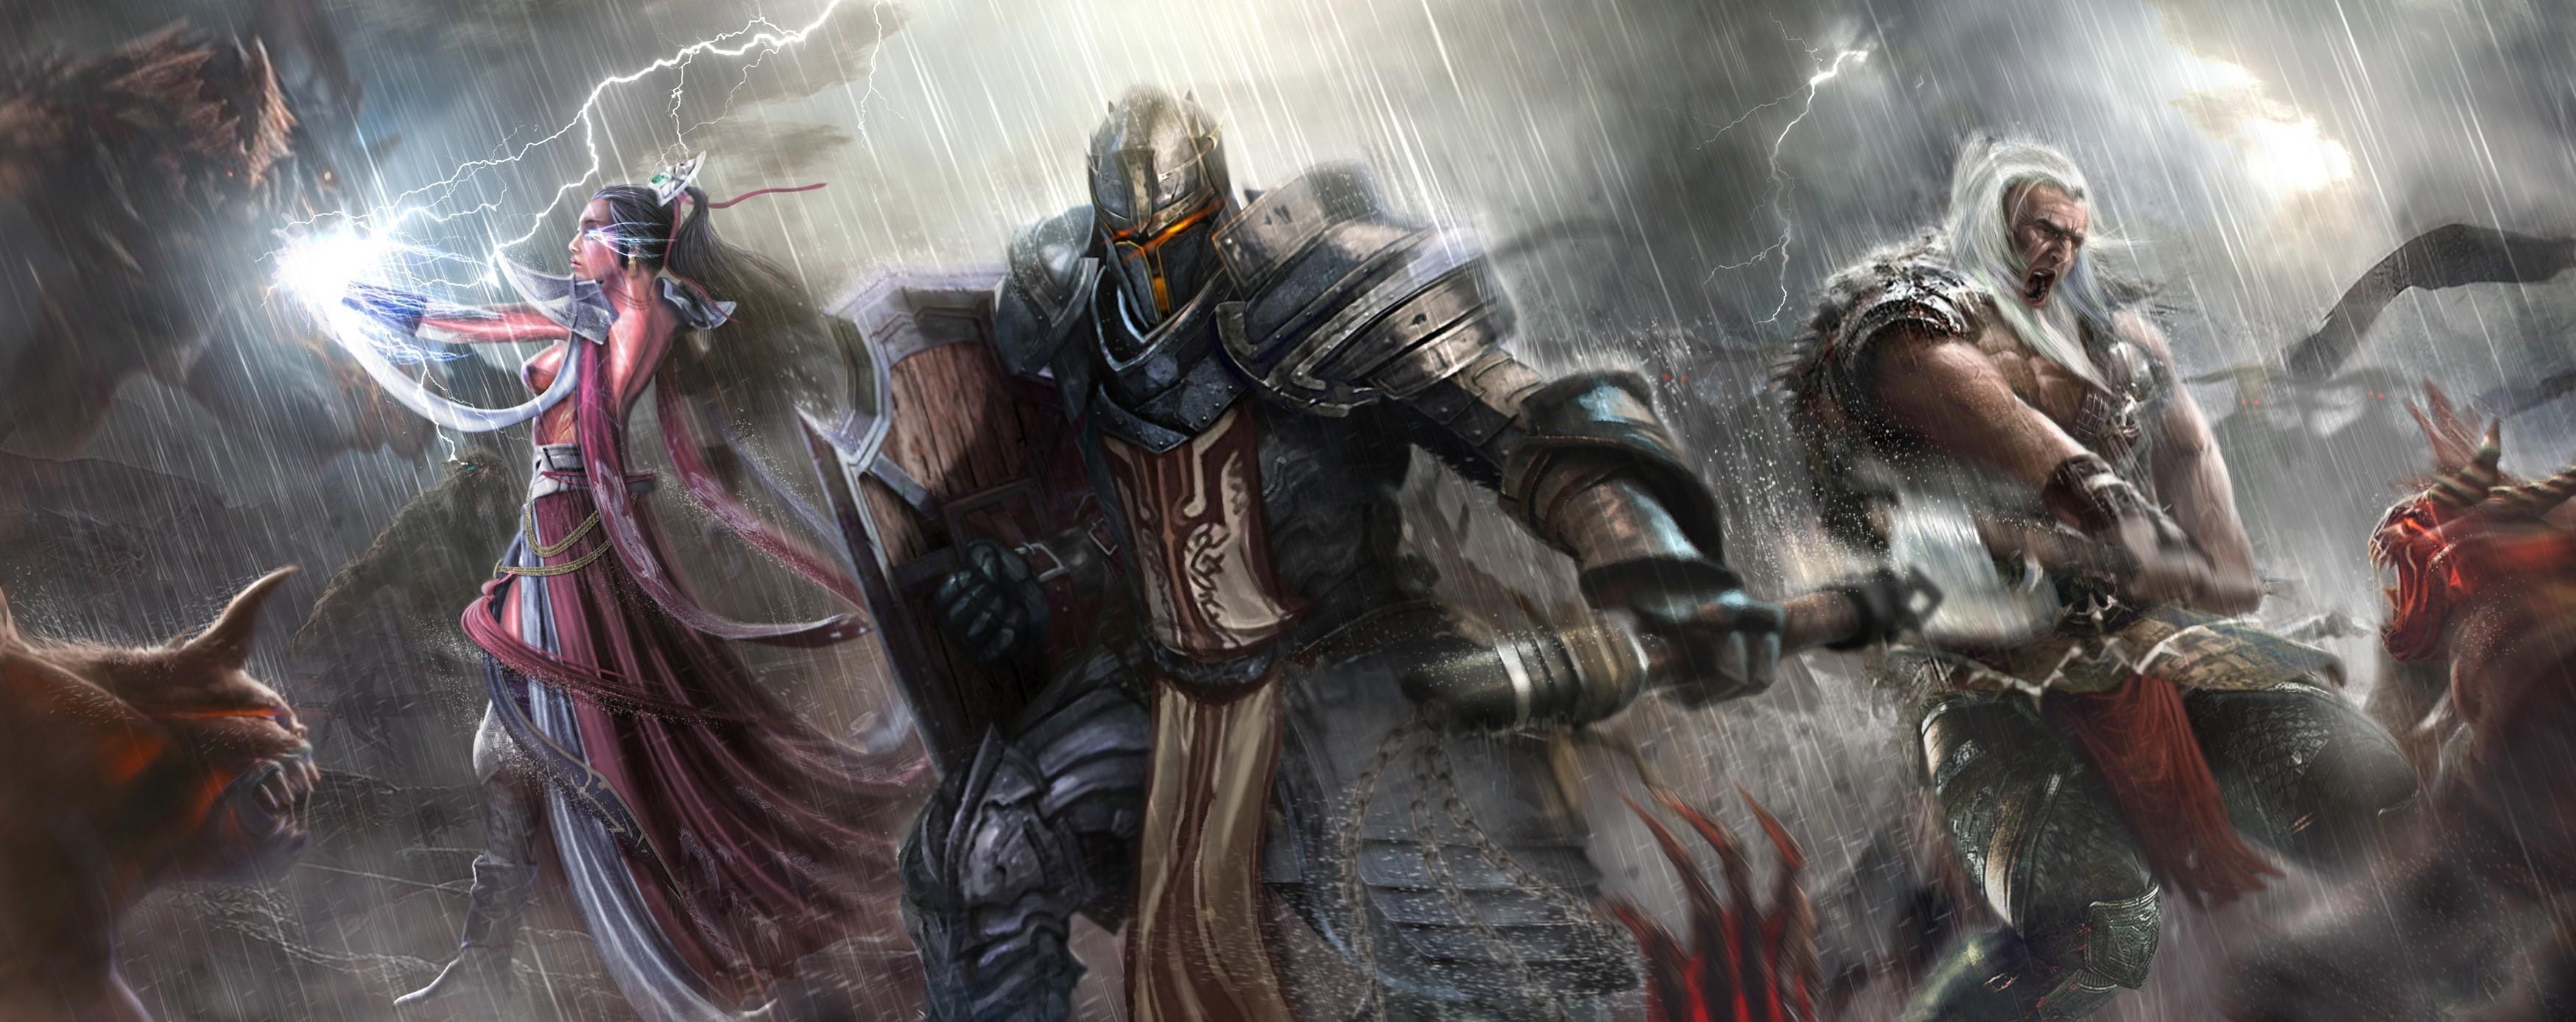 General 3498x1388 fantasy art Diablo III Diablo video games PC gaming video game art fantasy girl fantasy men